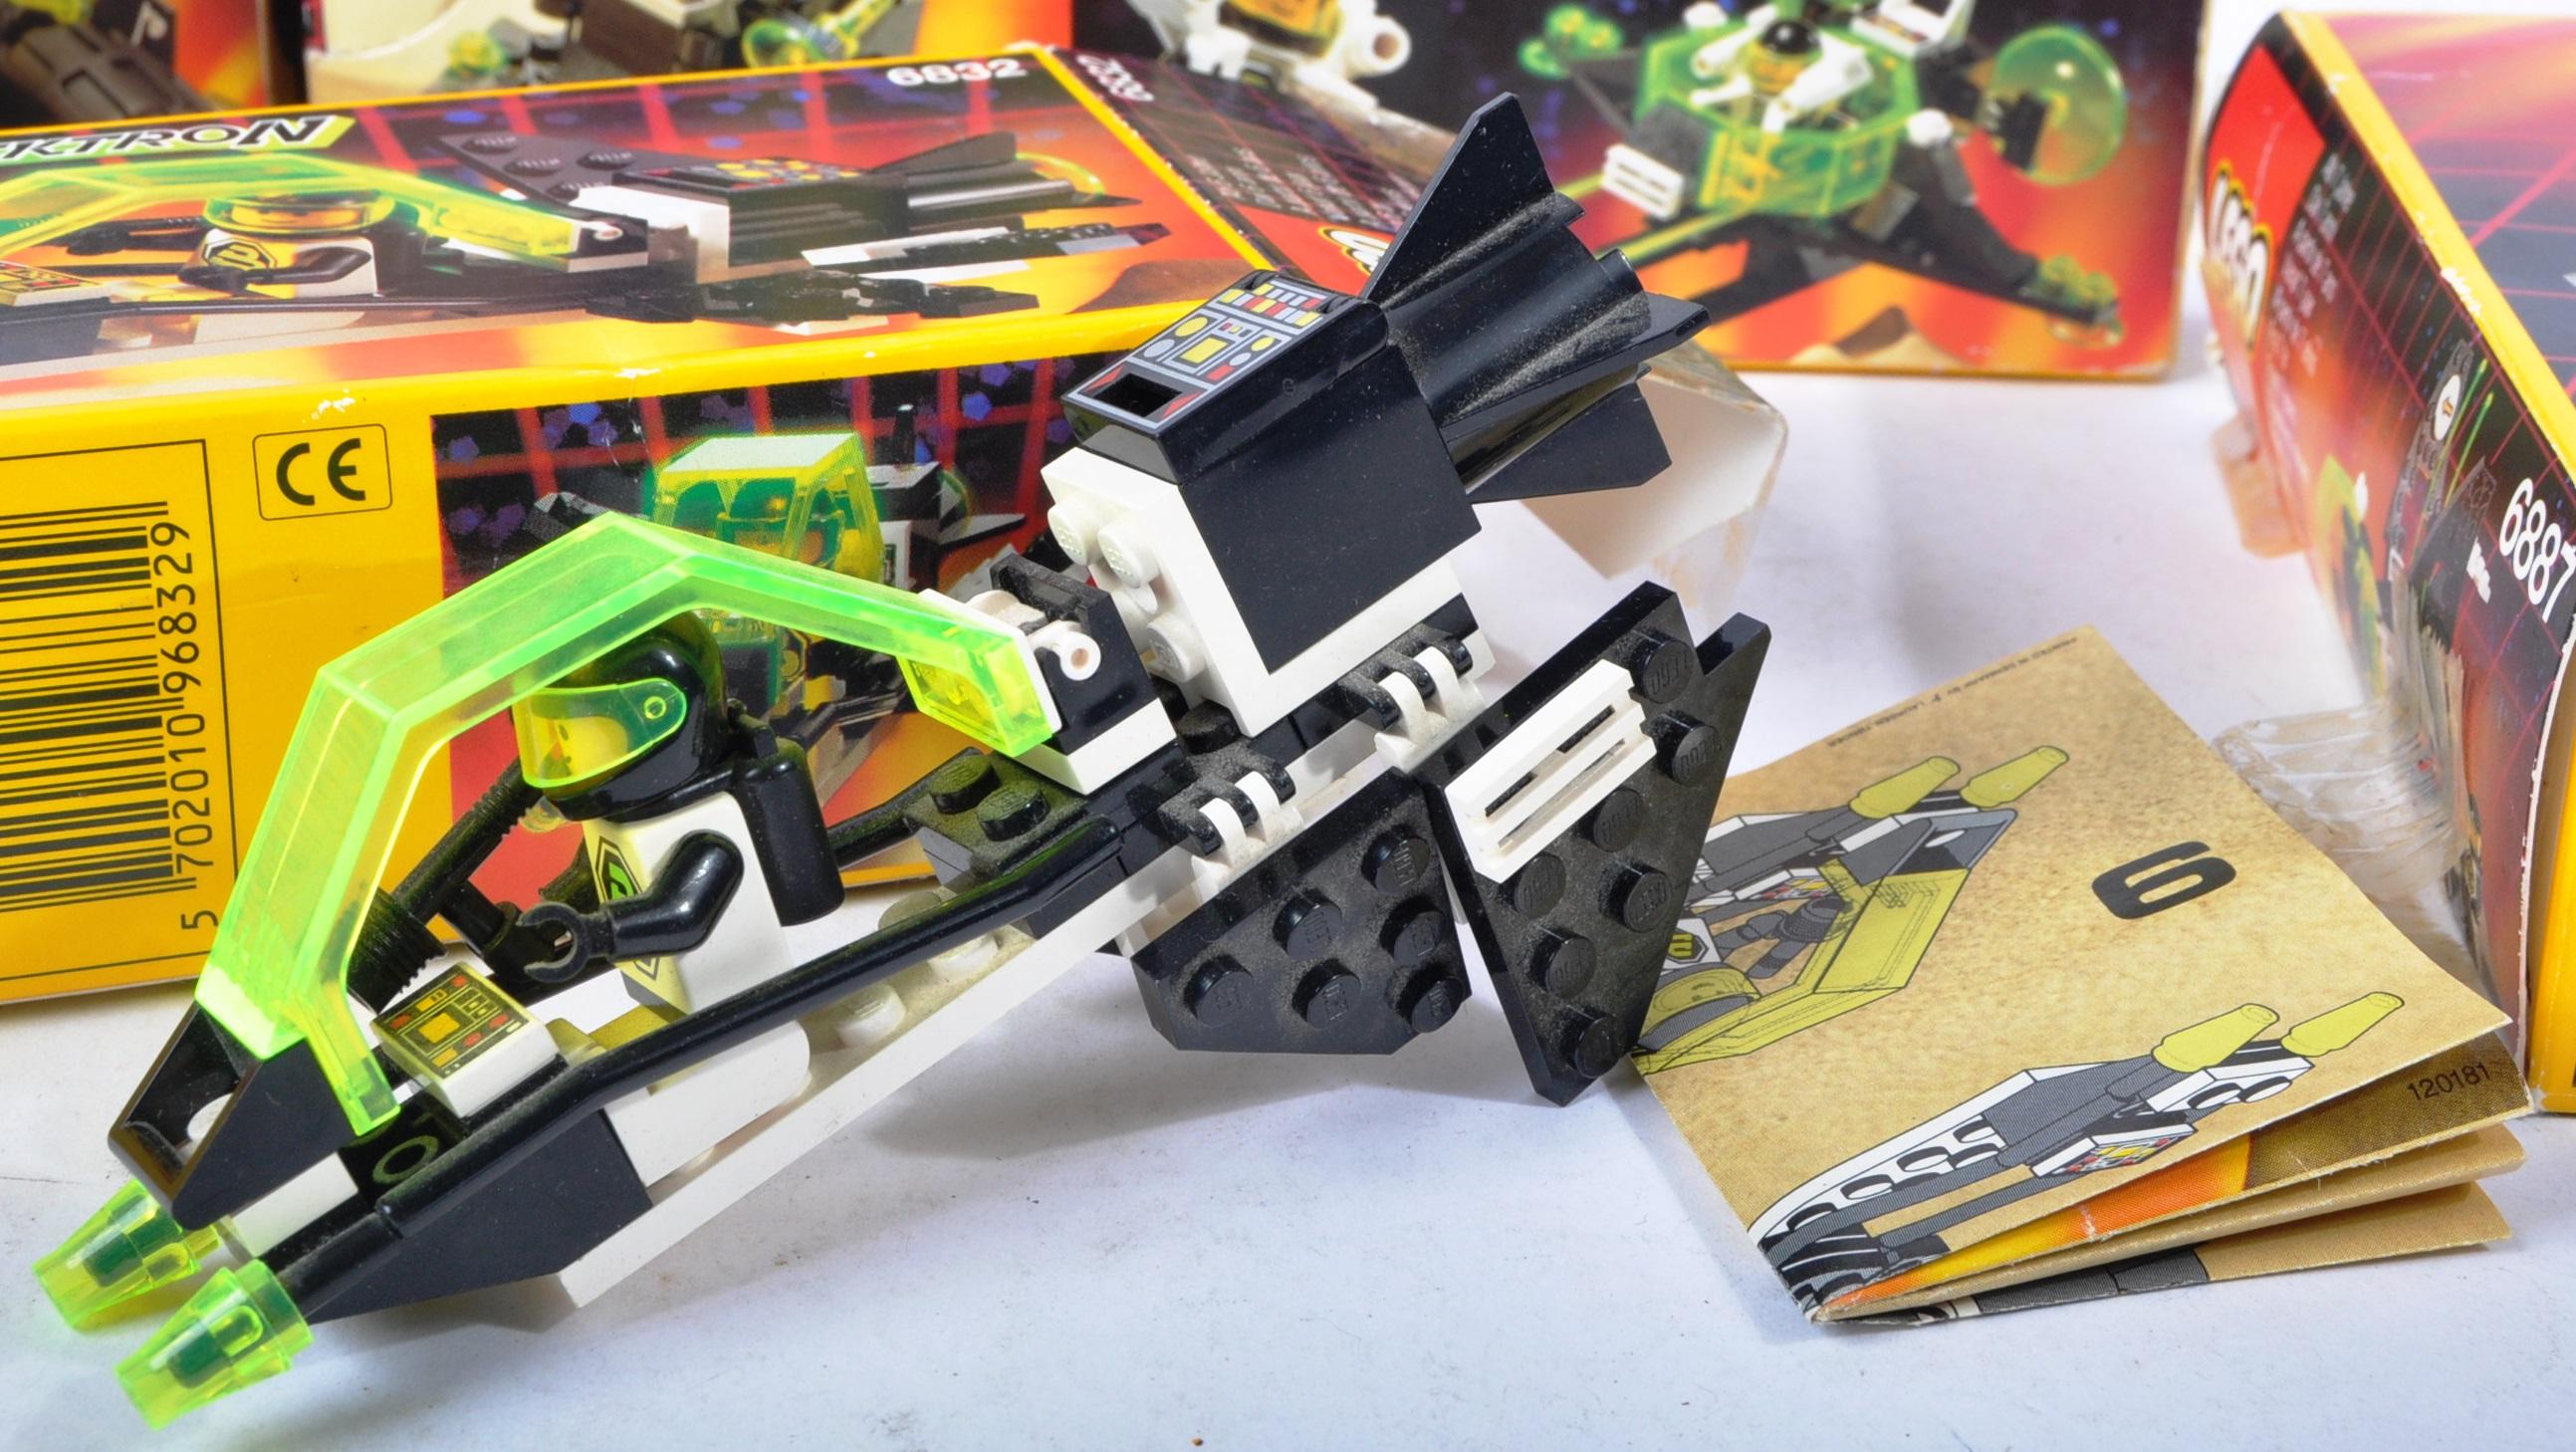 LEGO SETS - BLACKTRON - 6832 / 6833 / 6851 / 6878 / 6887 - Image 3 of 10